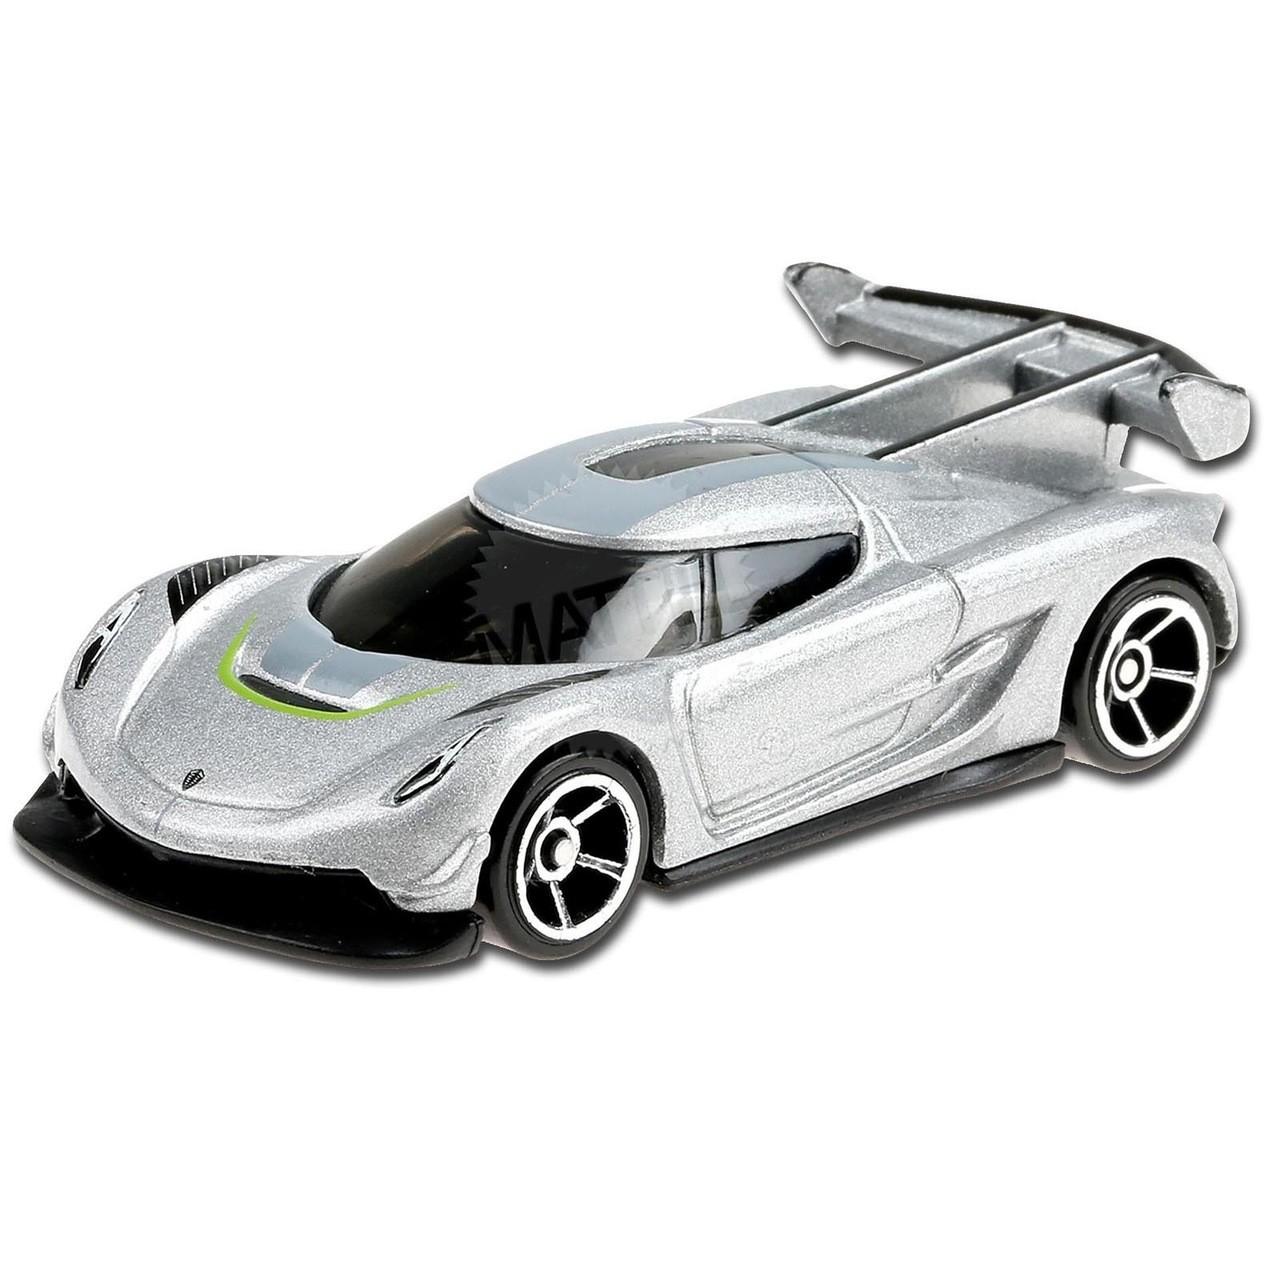 Carrinho Hot Wheels 2020 Keonigsegg Jesko (WBGH4) HW Exotics - Mattel